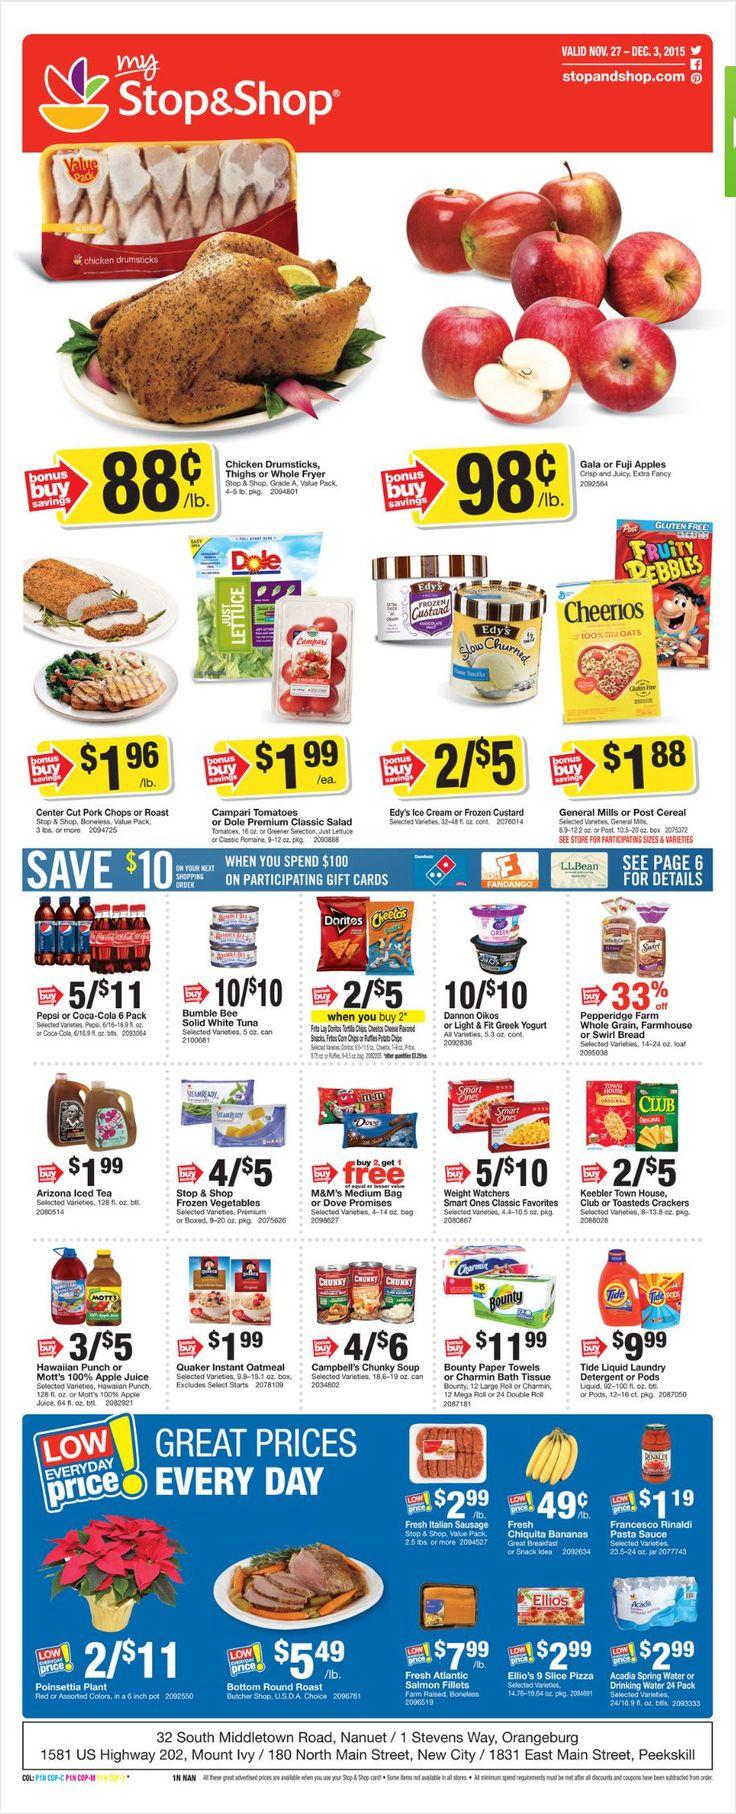 Stop and Shop Circular November 27 - December 3, 2015 - http://www.olcatalog.com/grocery/stop-and-shop-circular.html